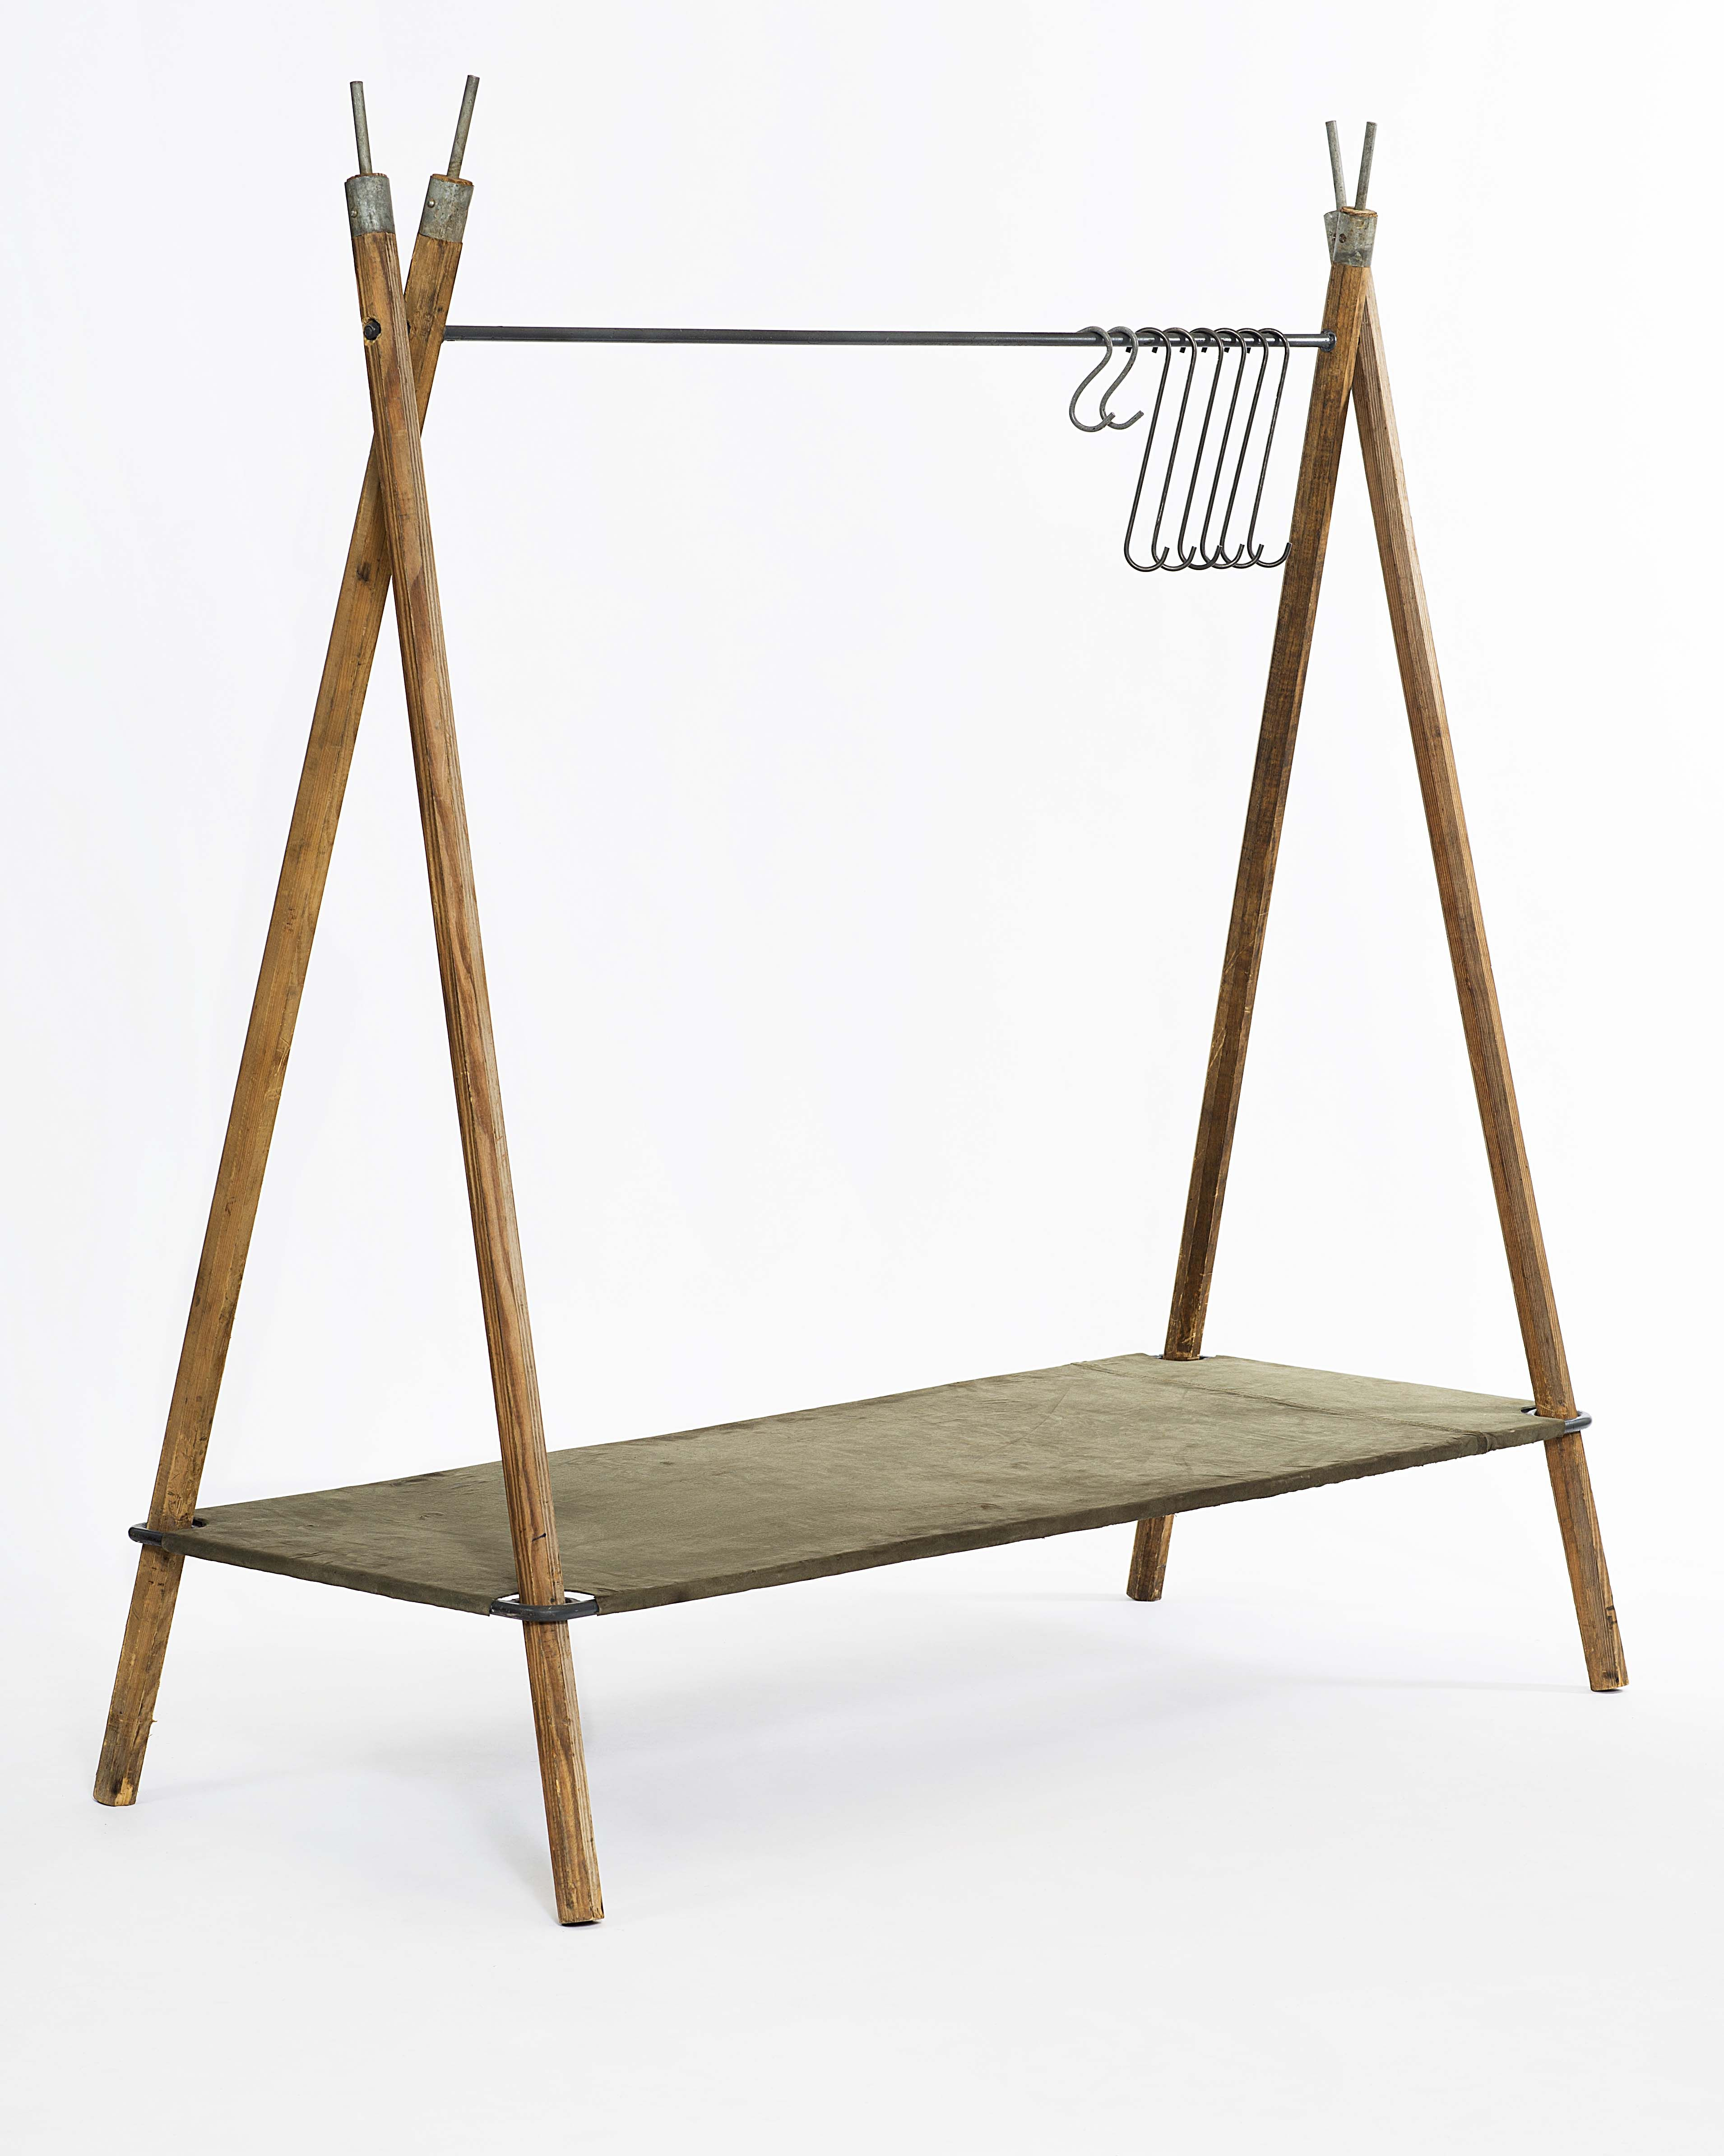 Stephen kenn clothing rack house pinterest clothes racks